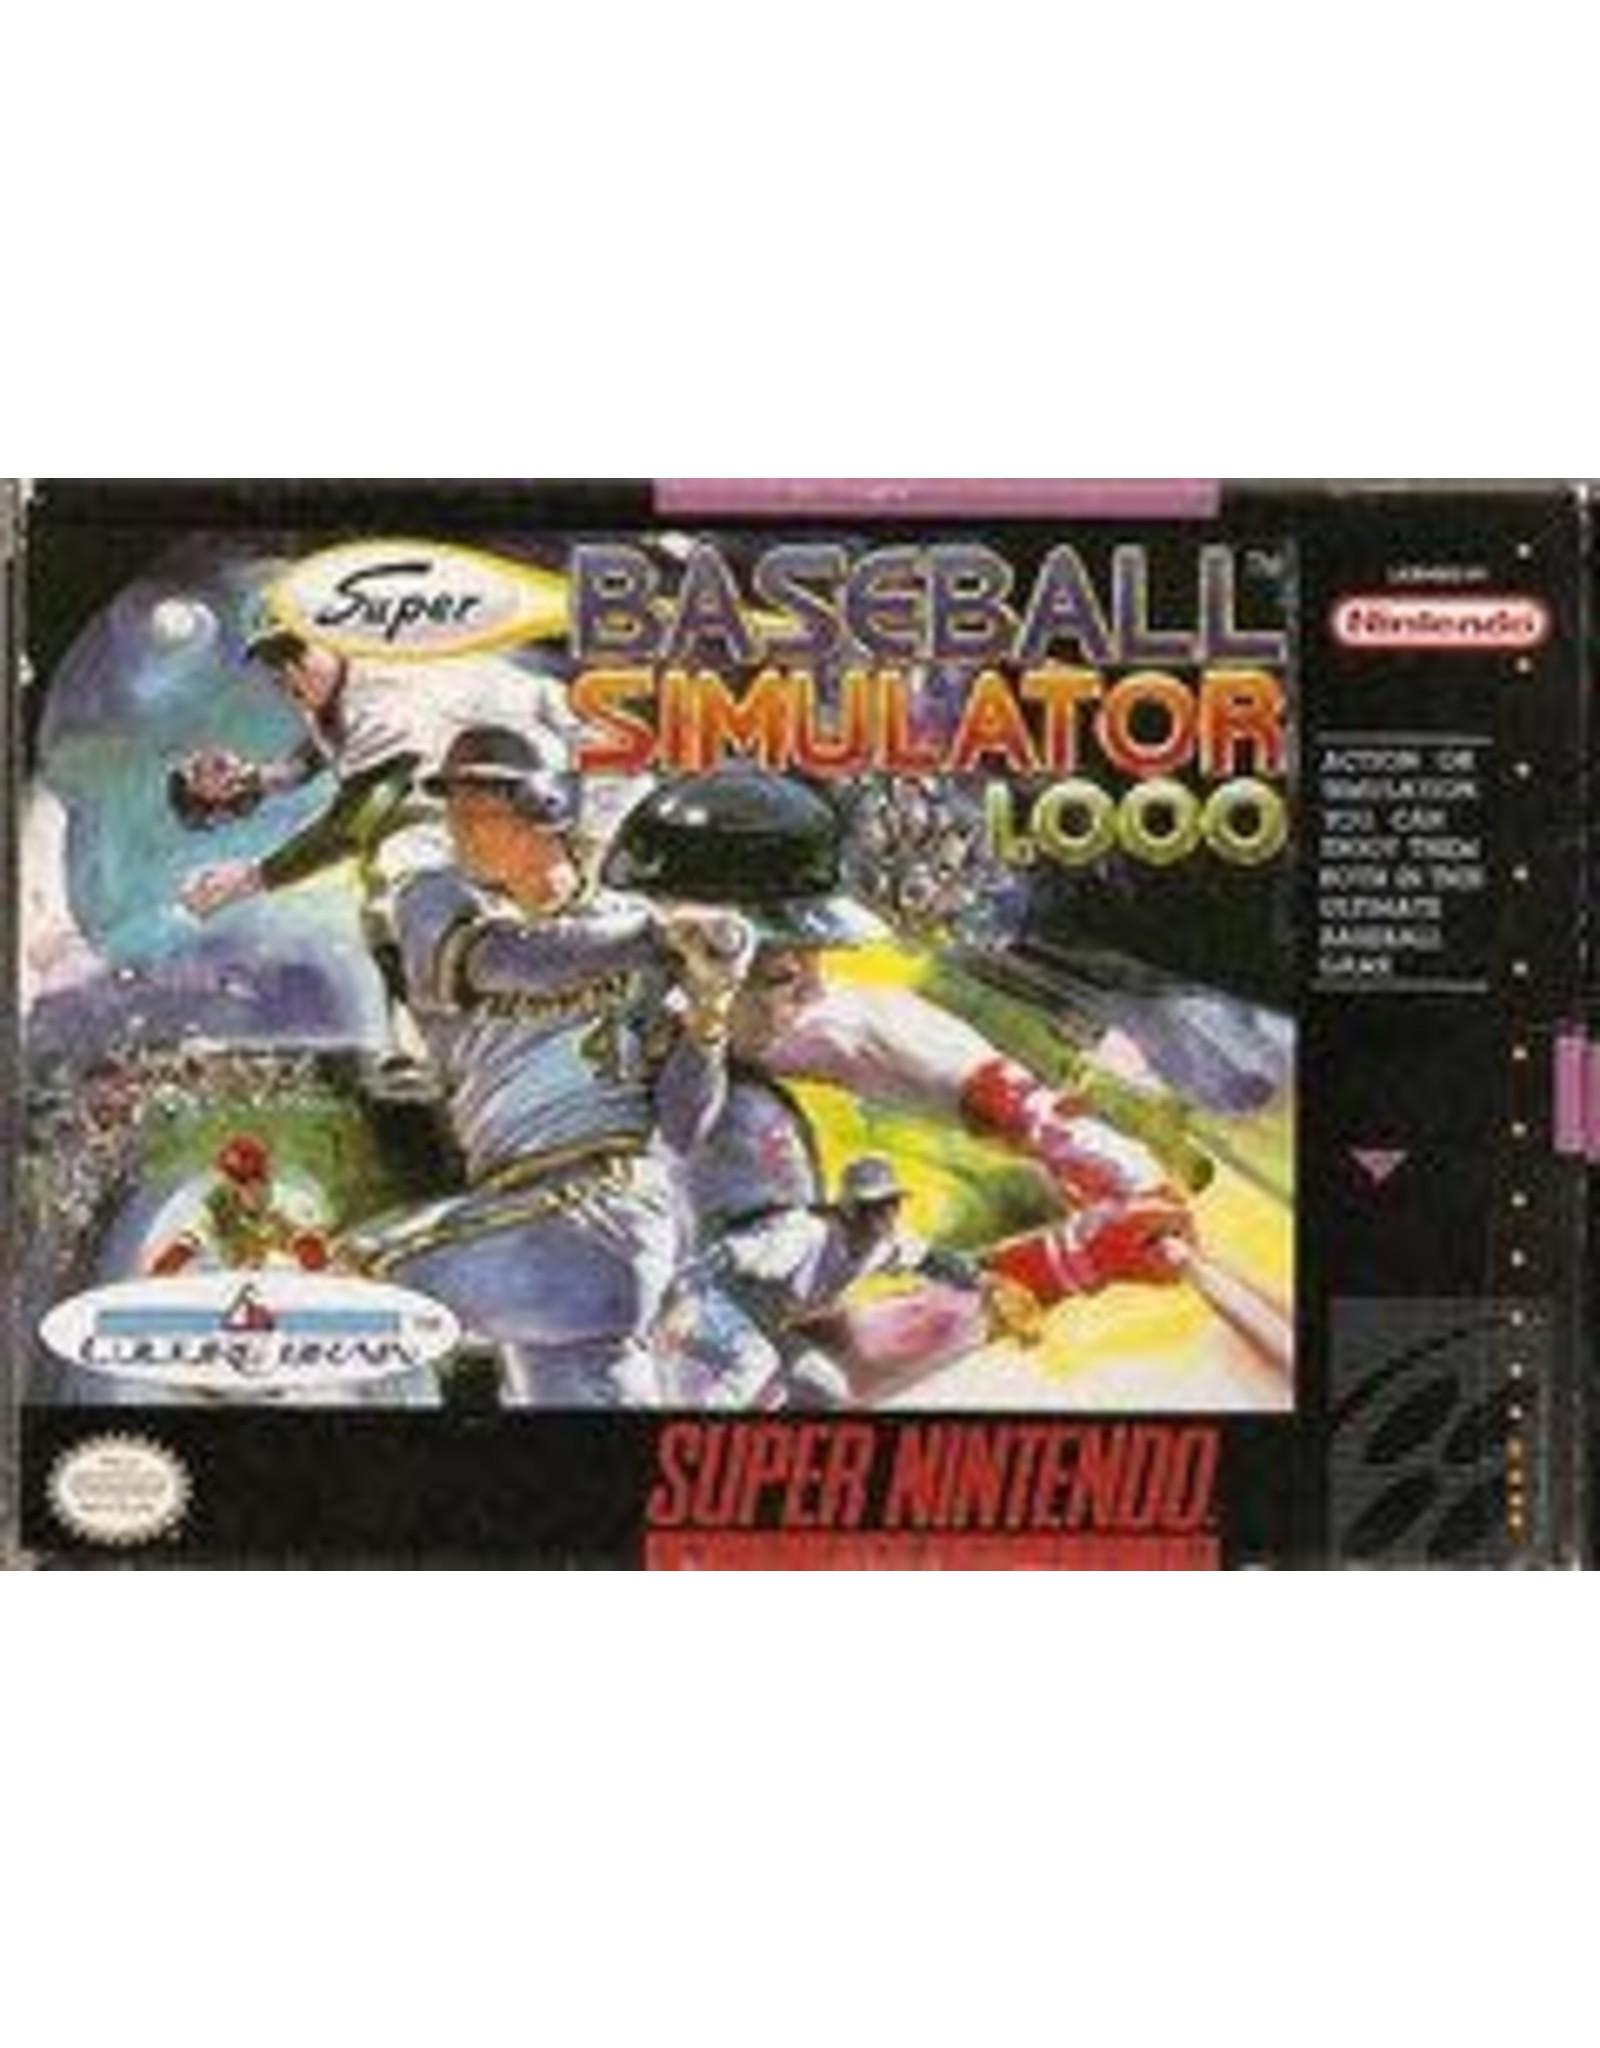 Super Nintendo Baseball Simulator 1.000 (Cart Only)